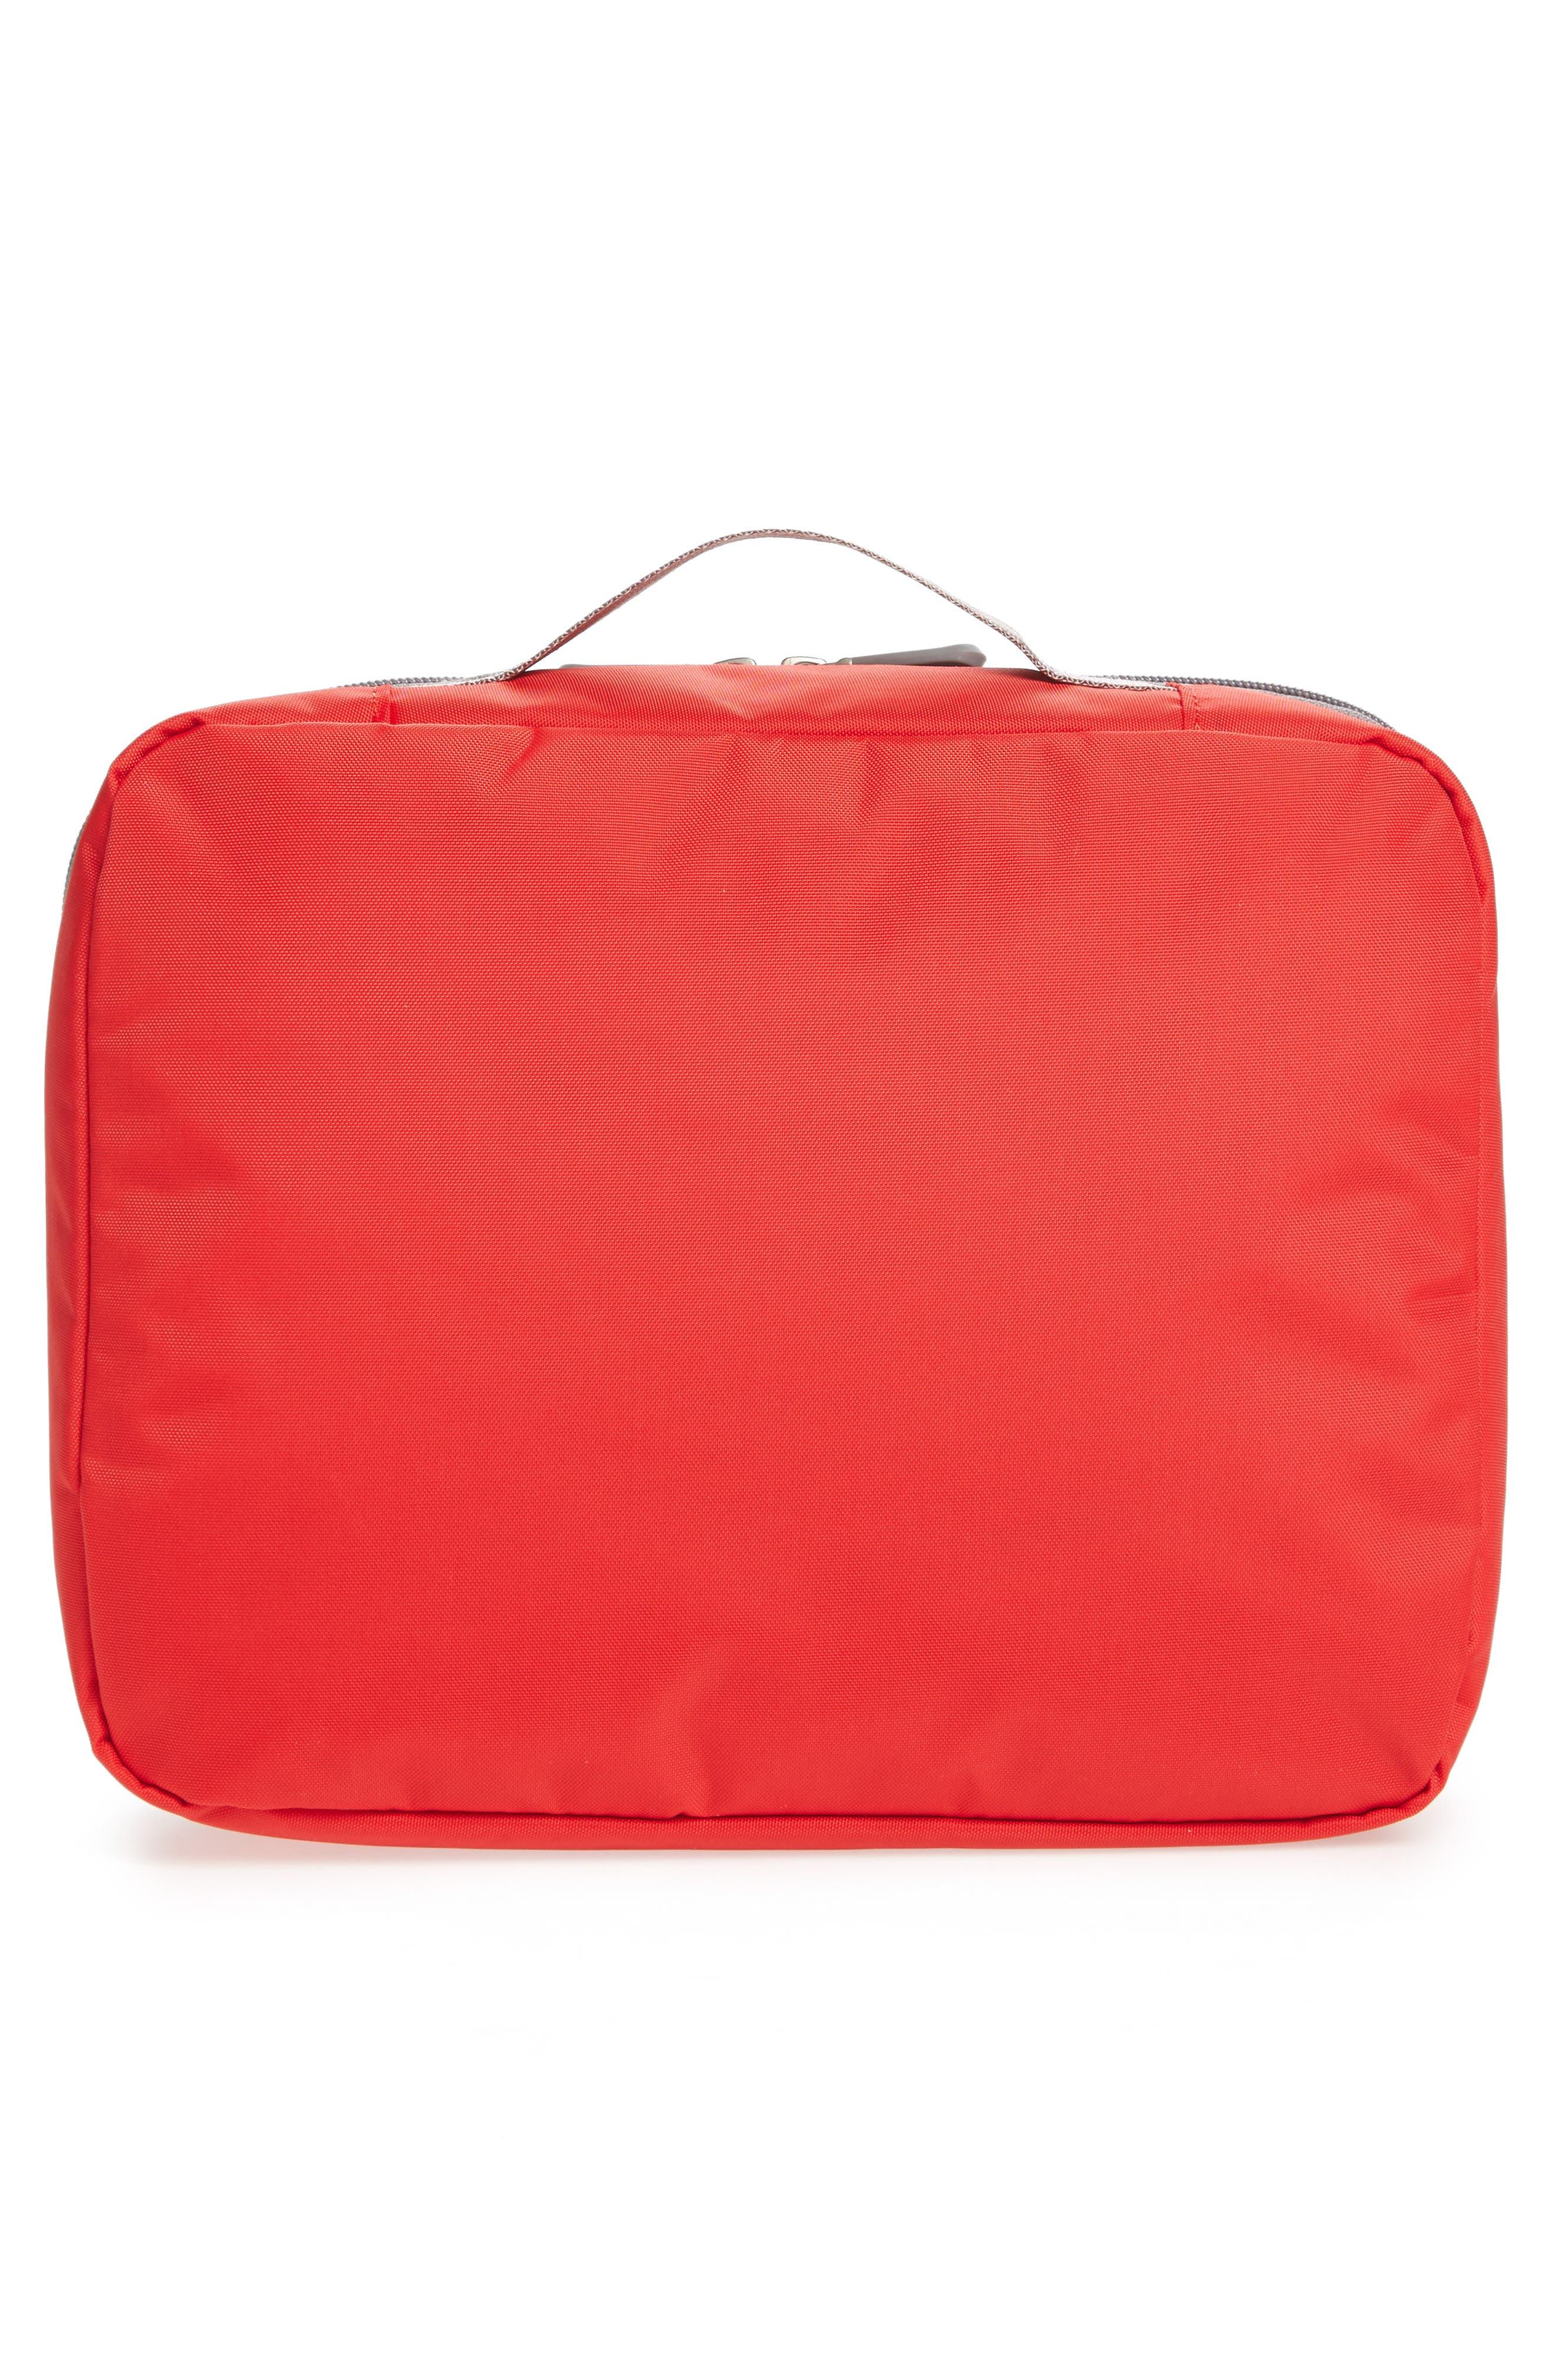 Seat Pak Pro Plane Seat Organizer,                             Alternate thumbnail 2, color,                             Red